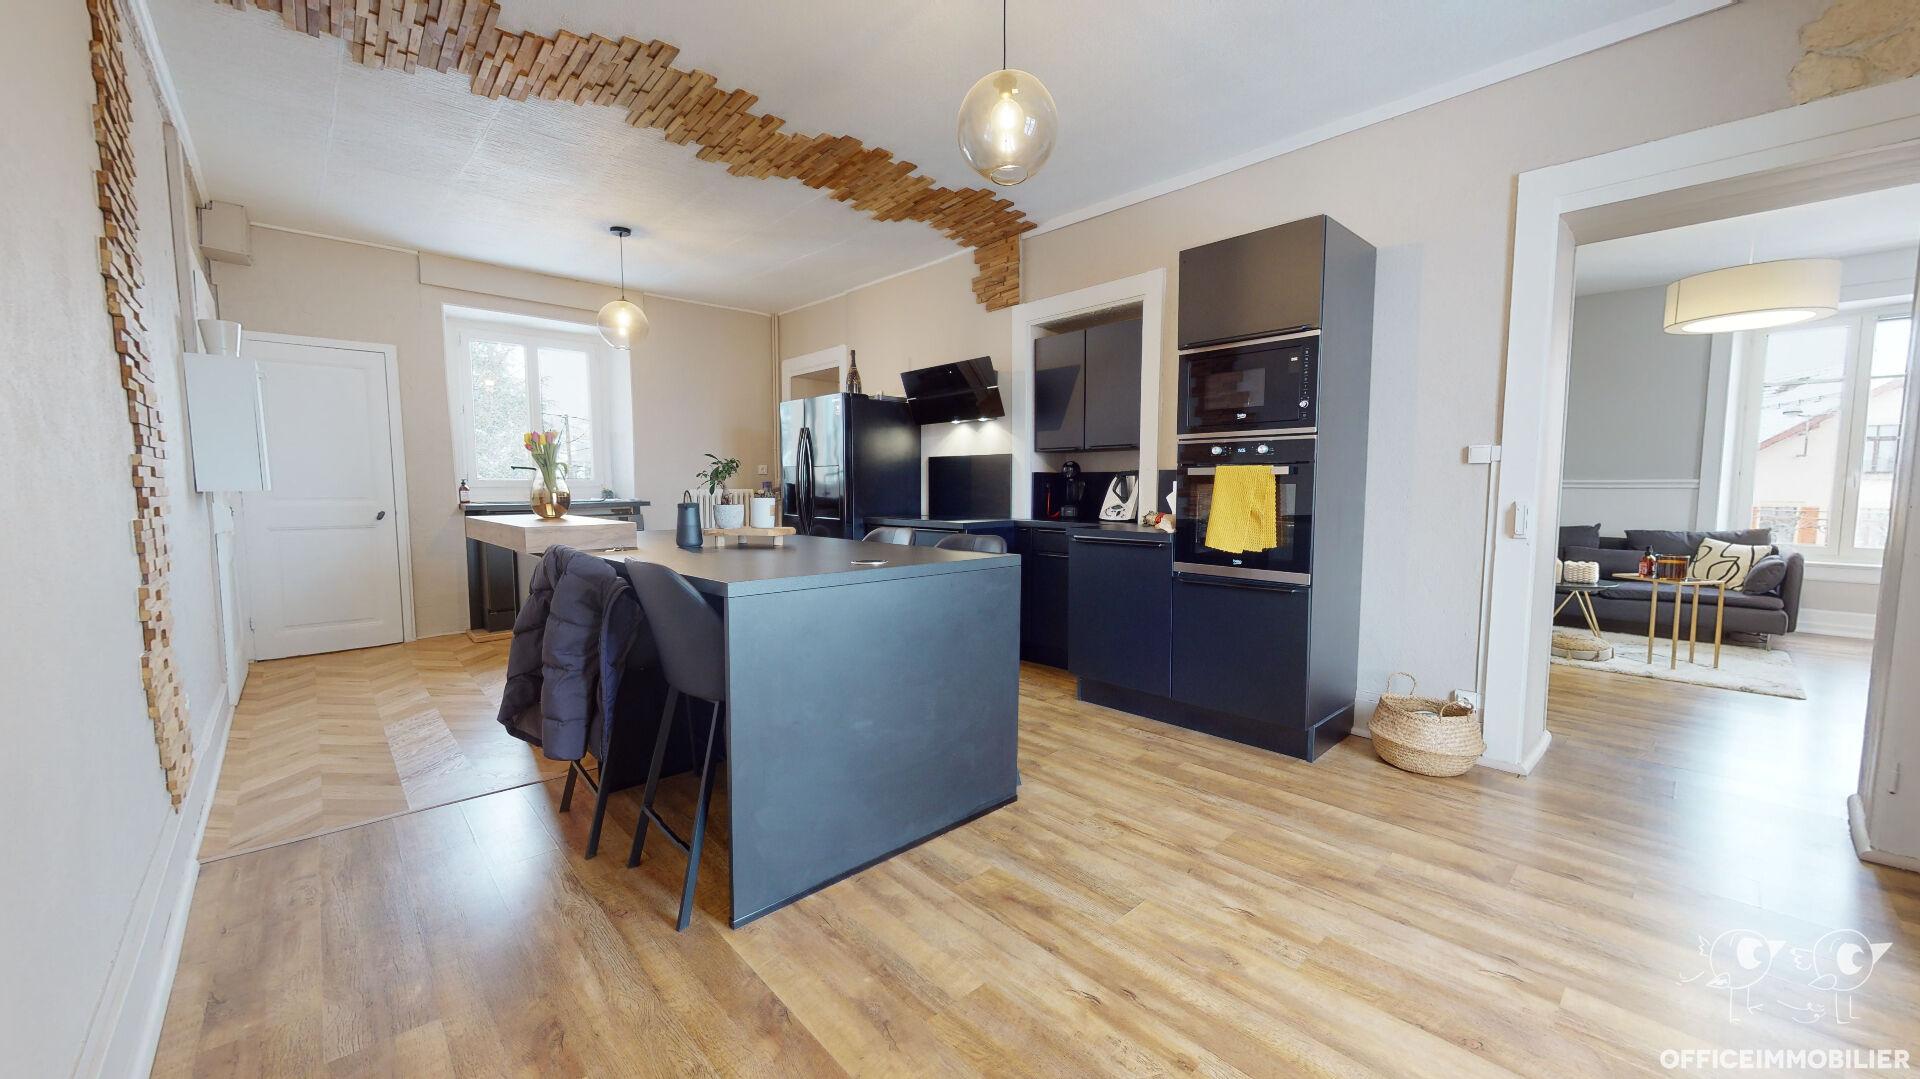 appartement 71m²  pontarlier  - photo 3